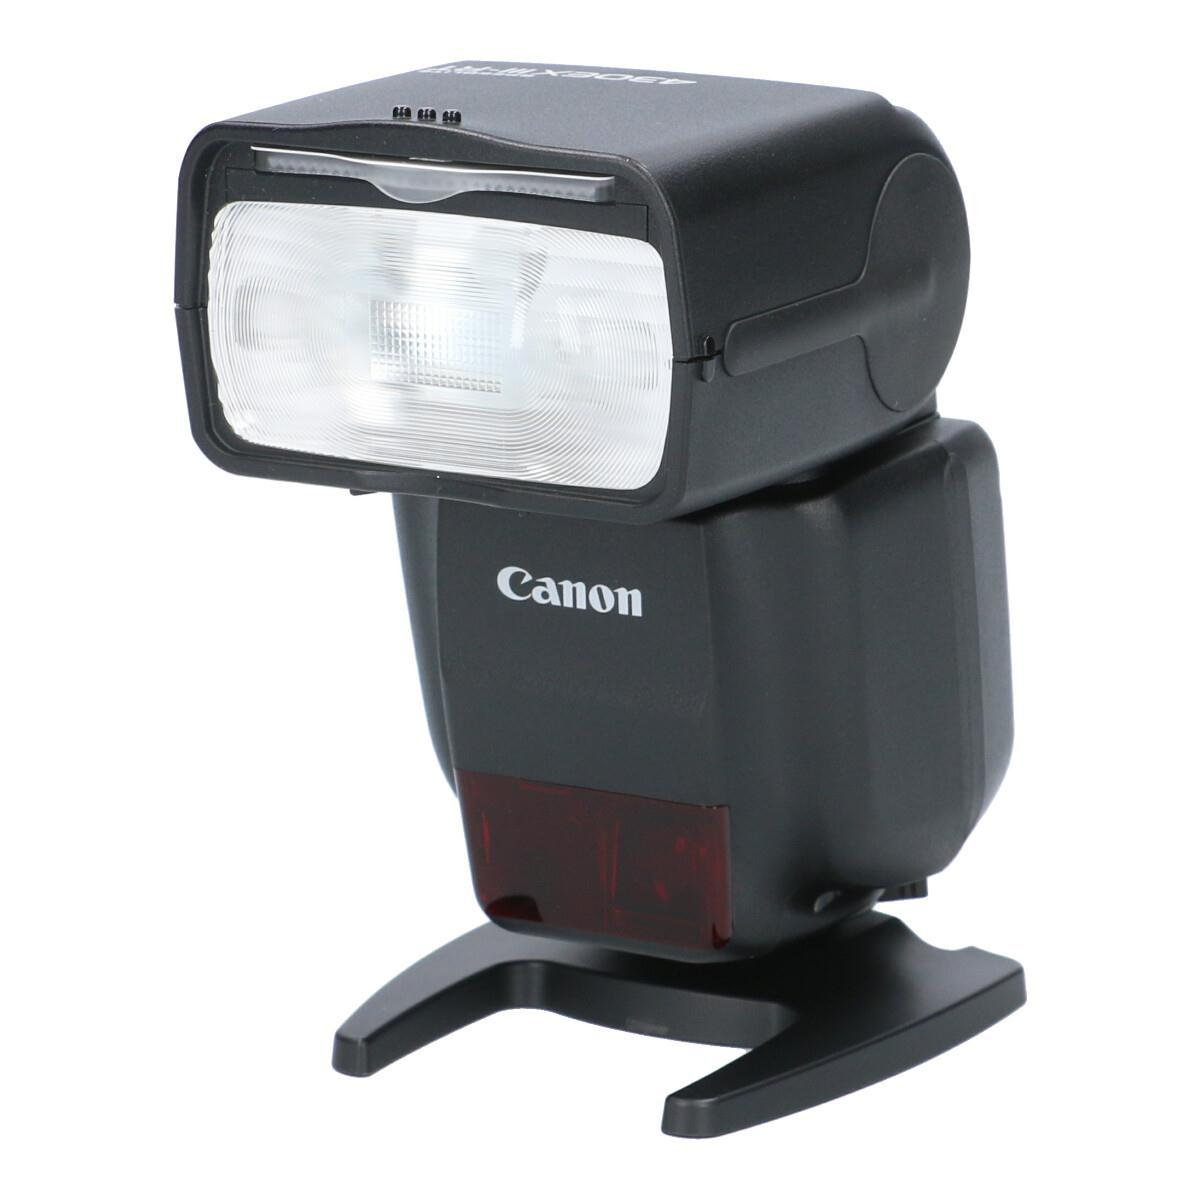 CANON 430EX??RT